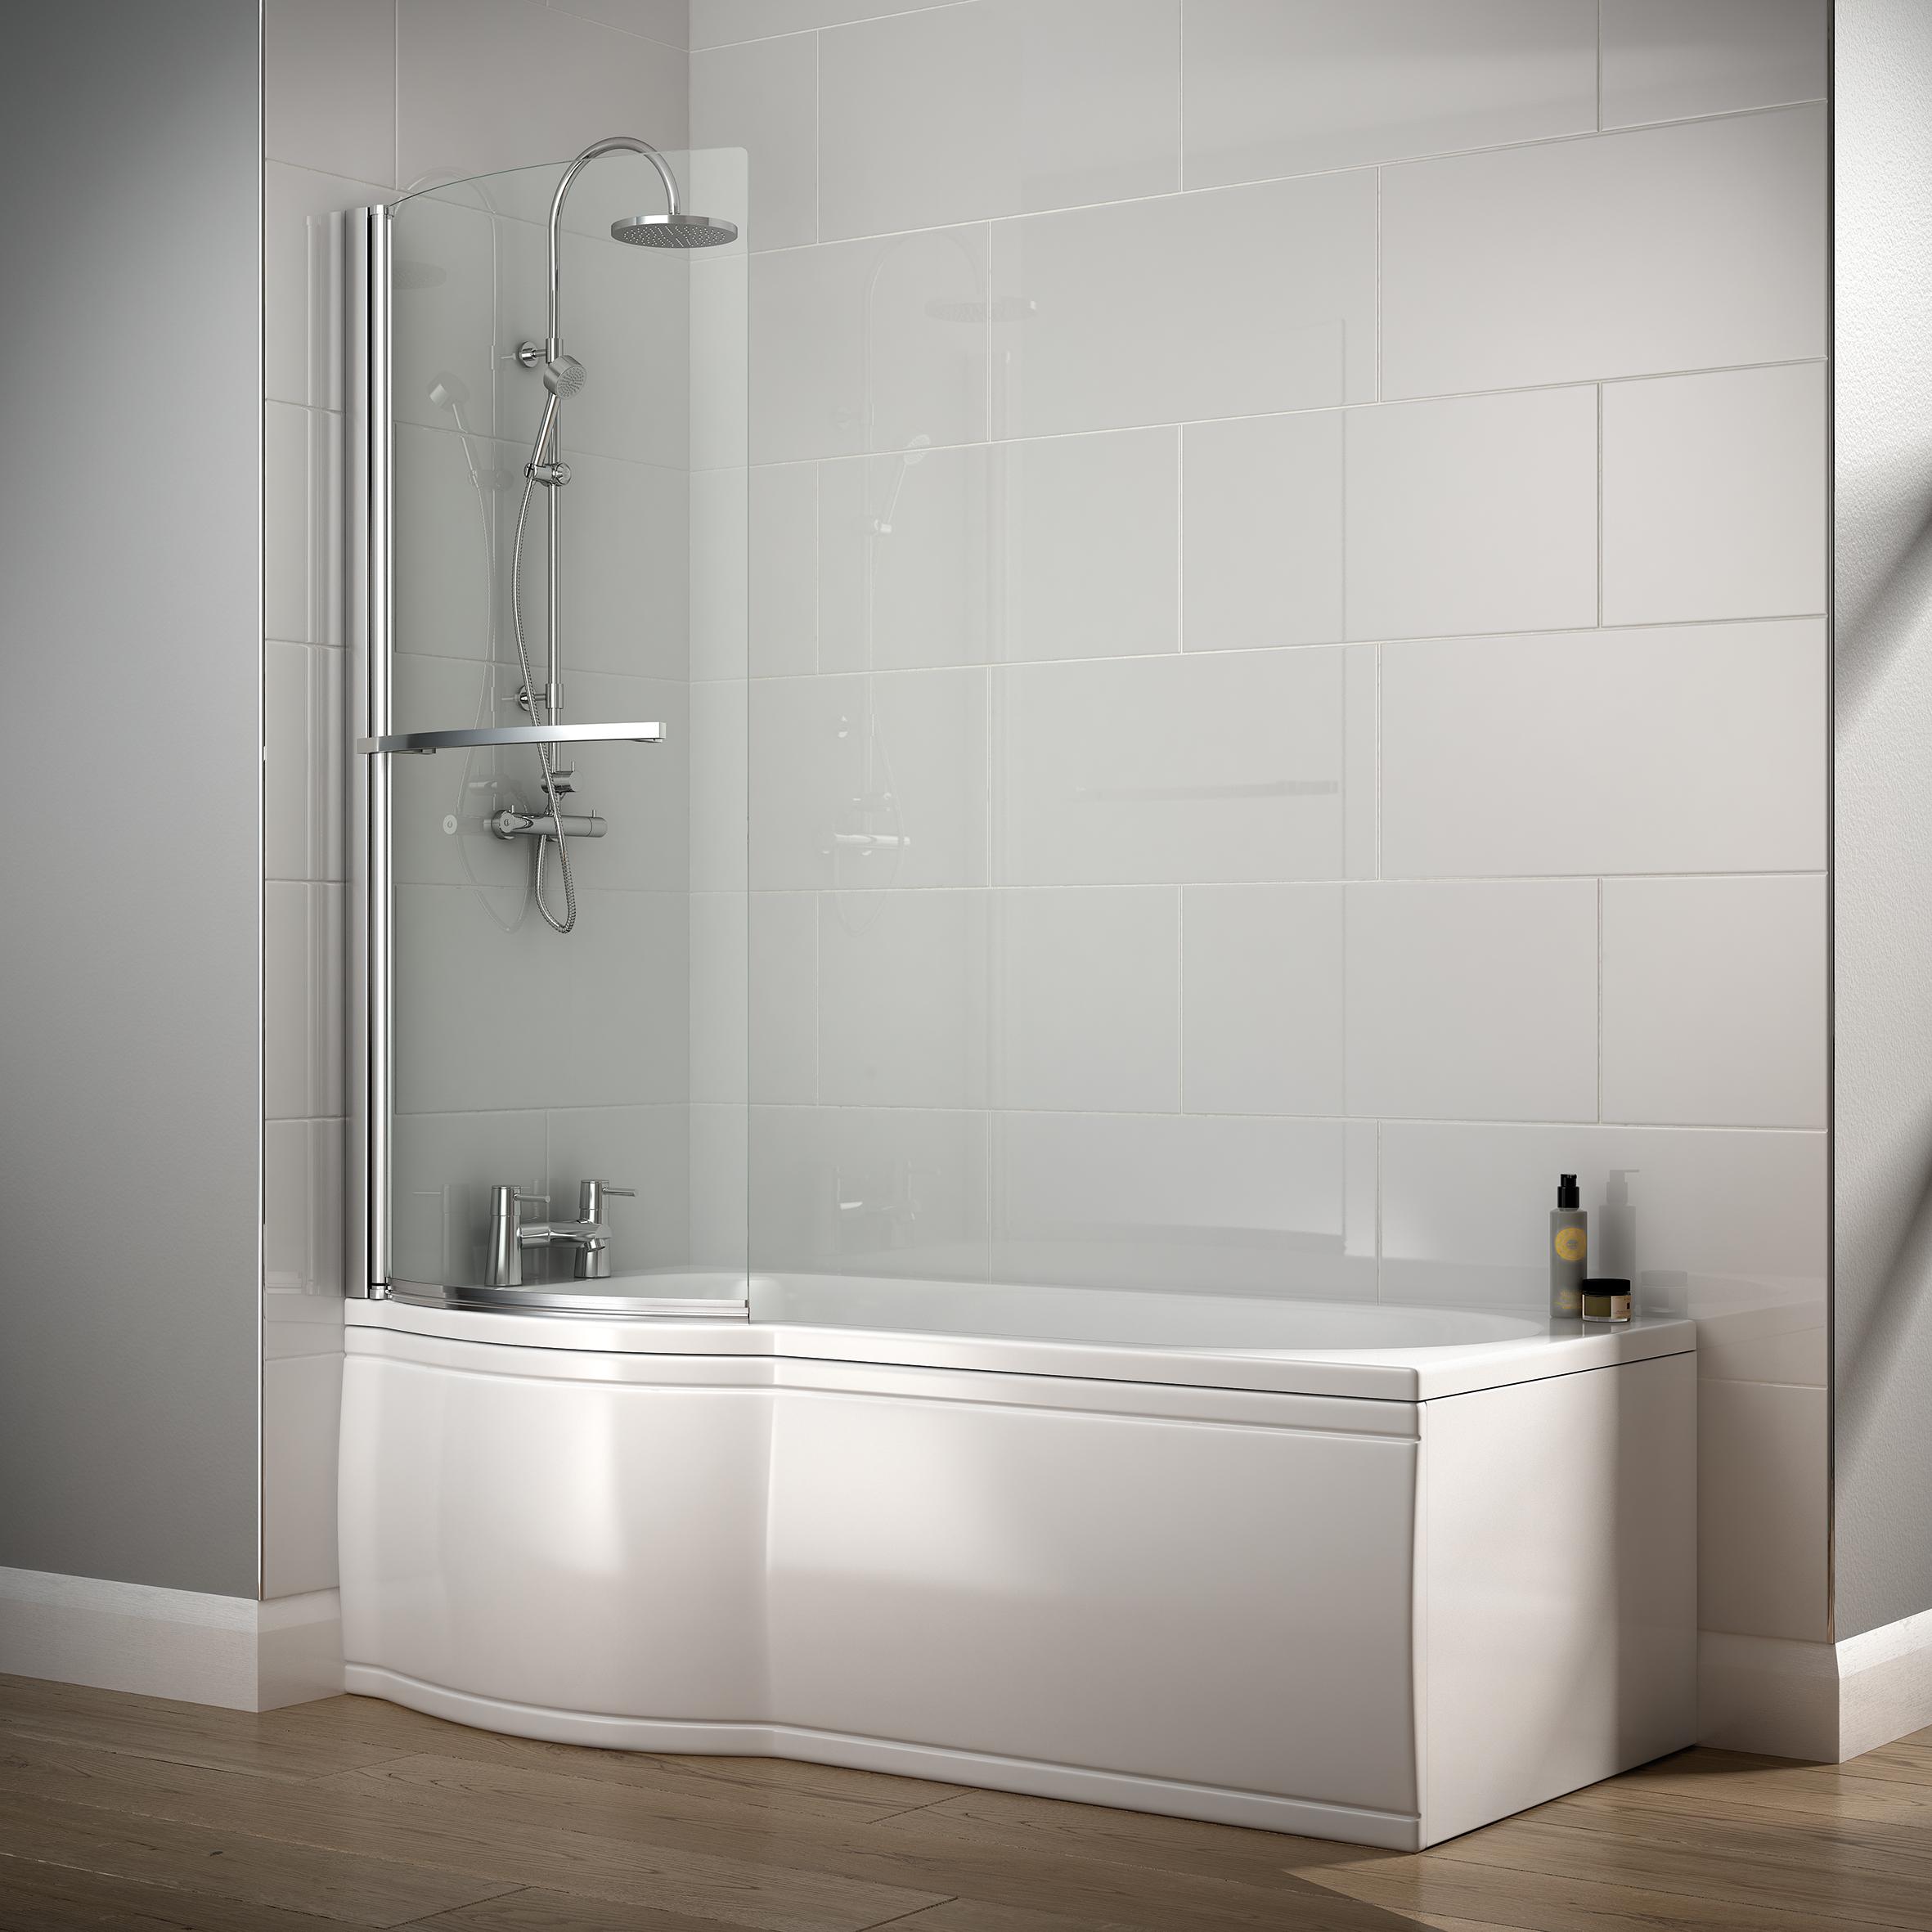 clovelly l shaped acrylic shower bath no tap holes bretton park saltaire p shaped acrylic shower bath no tap holes bretton park